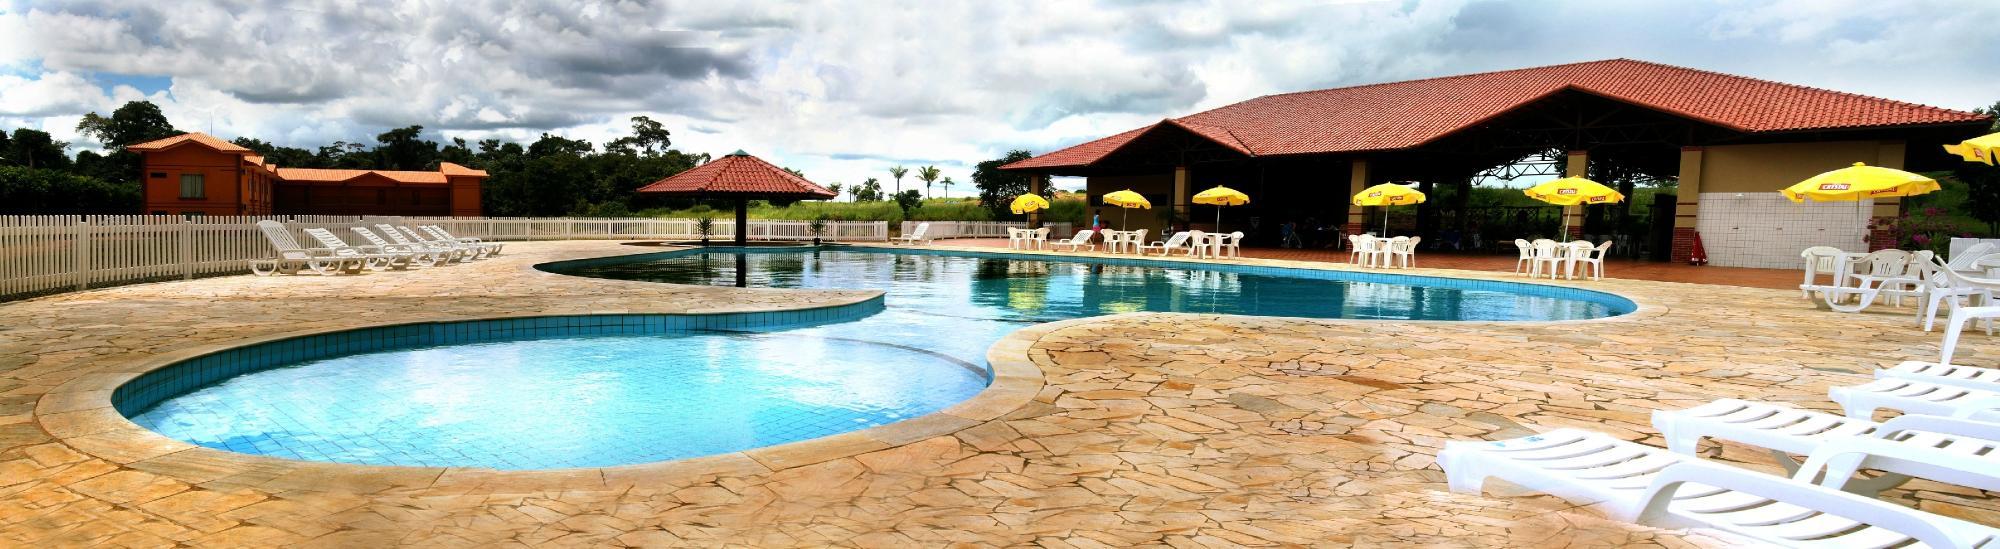 Cacoal Selva Park Hotel